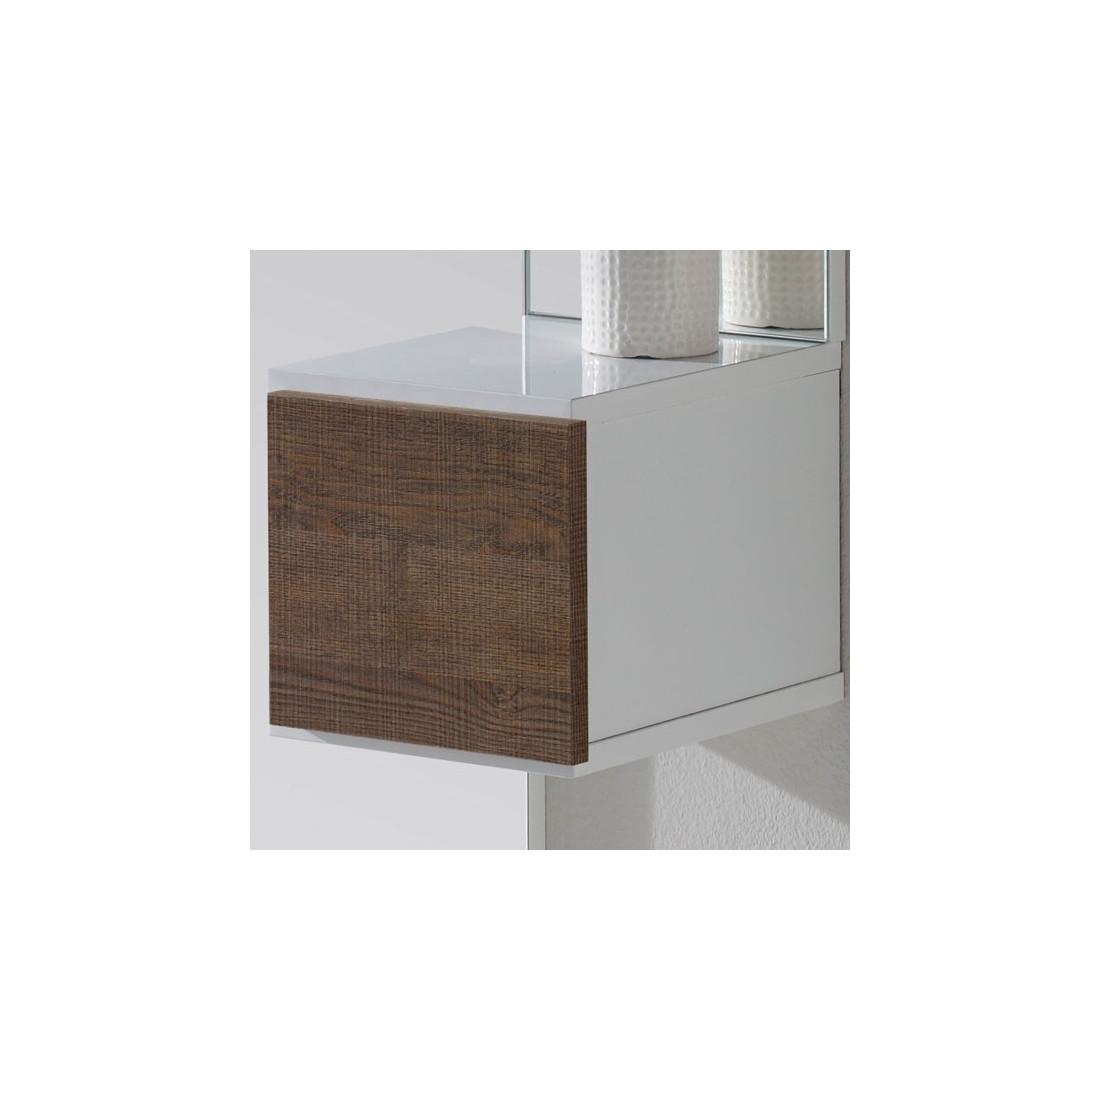 meuble d 39 entr e blanc ch ne fonc miroir sirra petits meubles. Black Bedroom Furniture Sets. Home Design Ideas